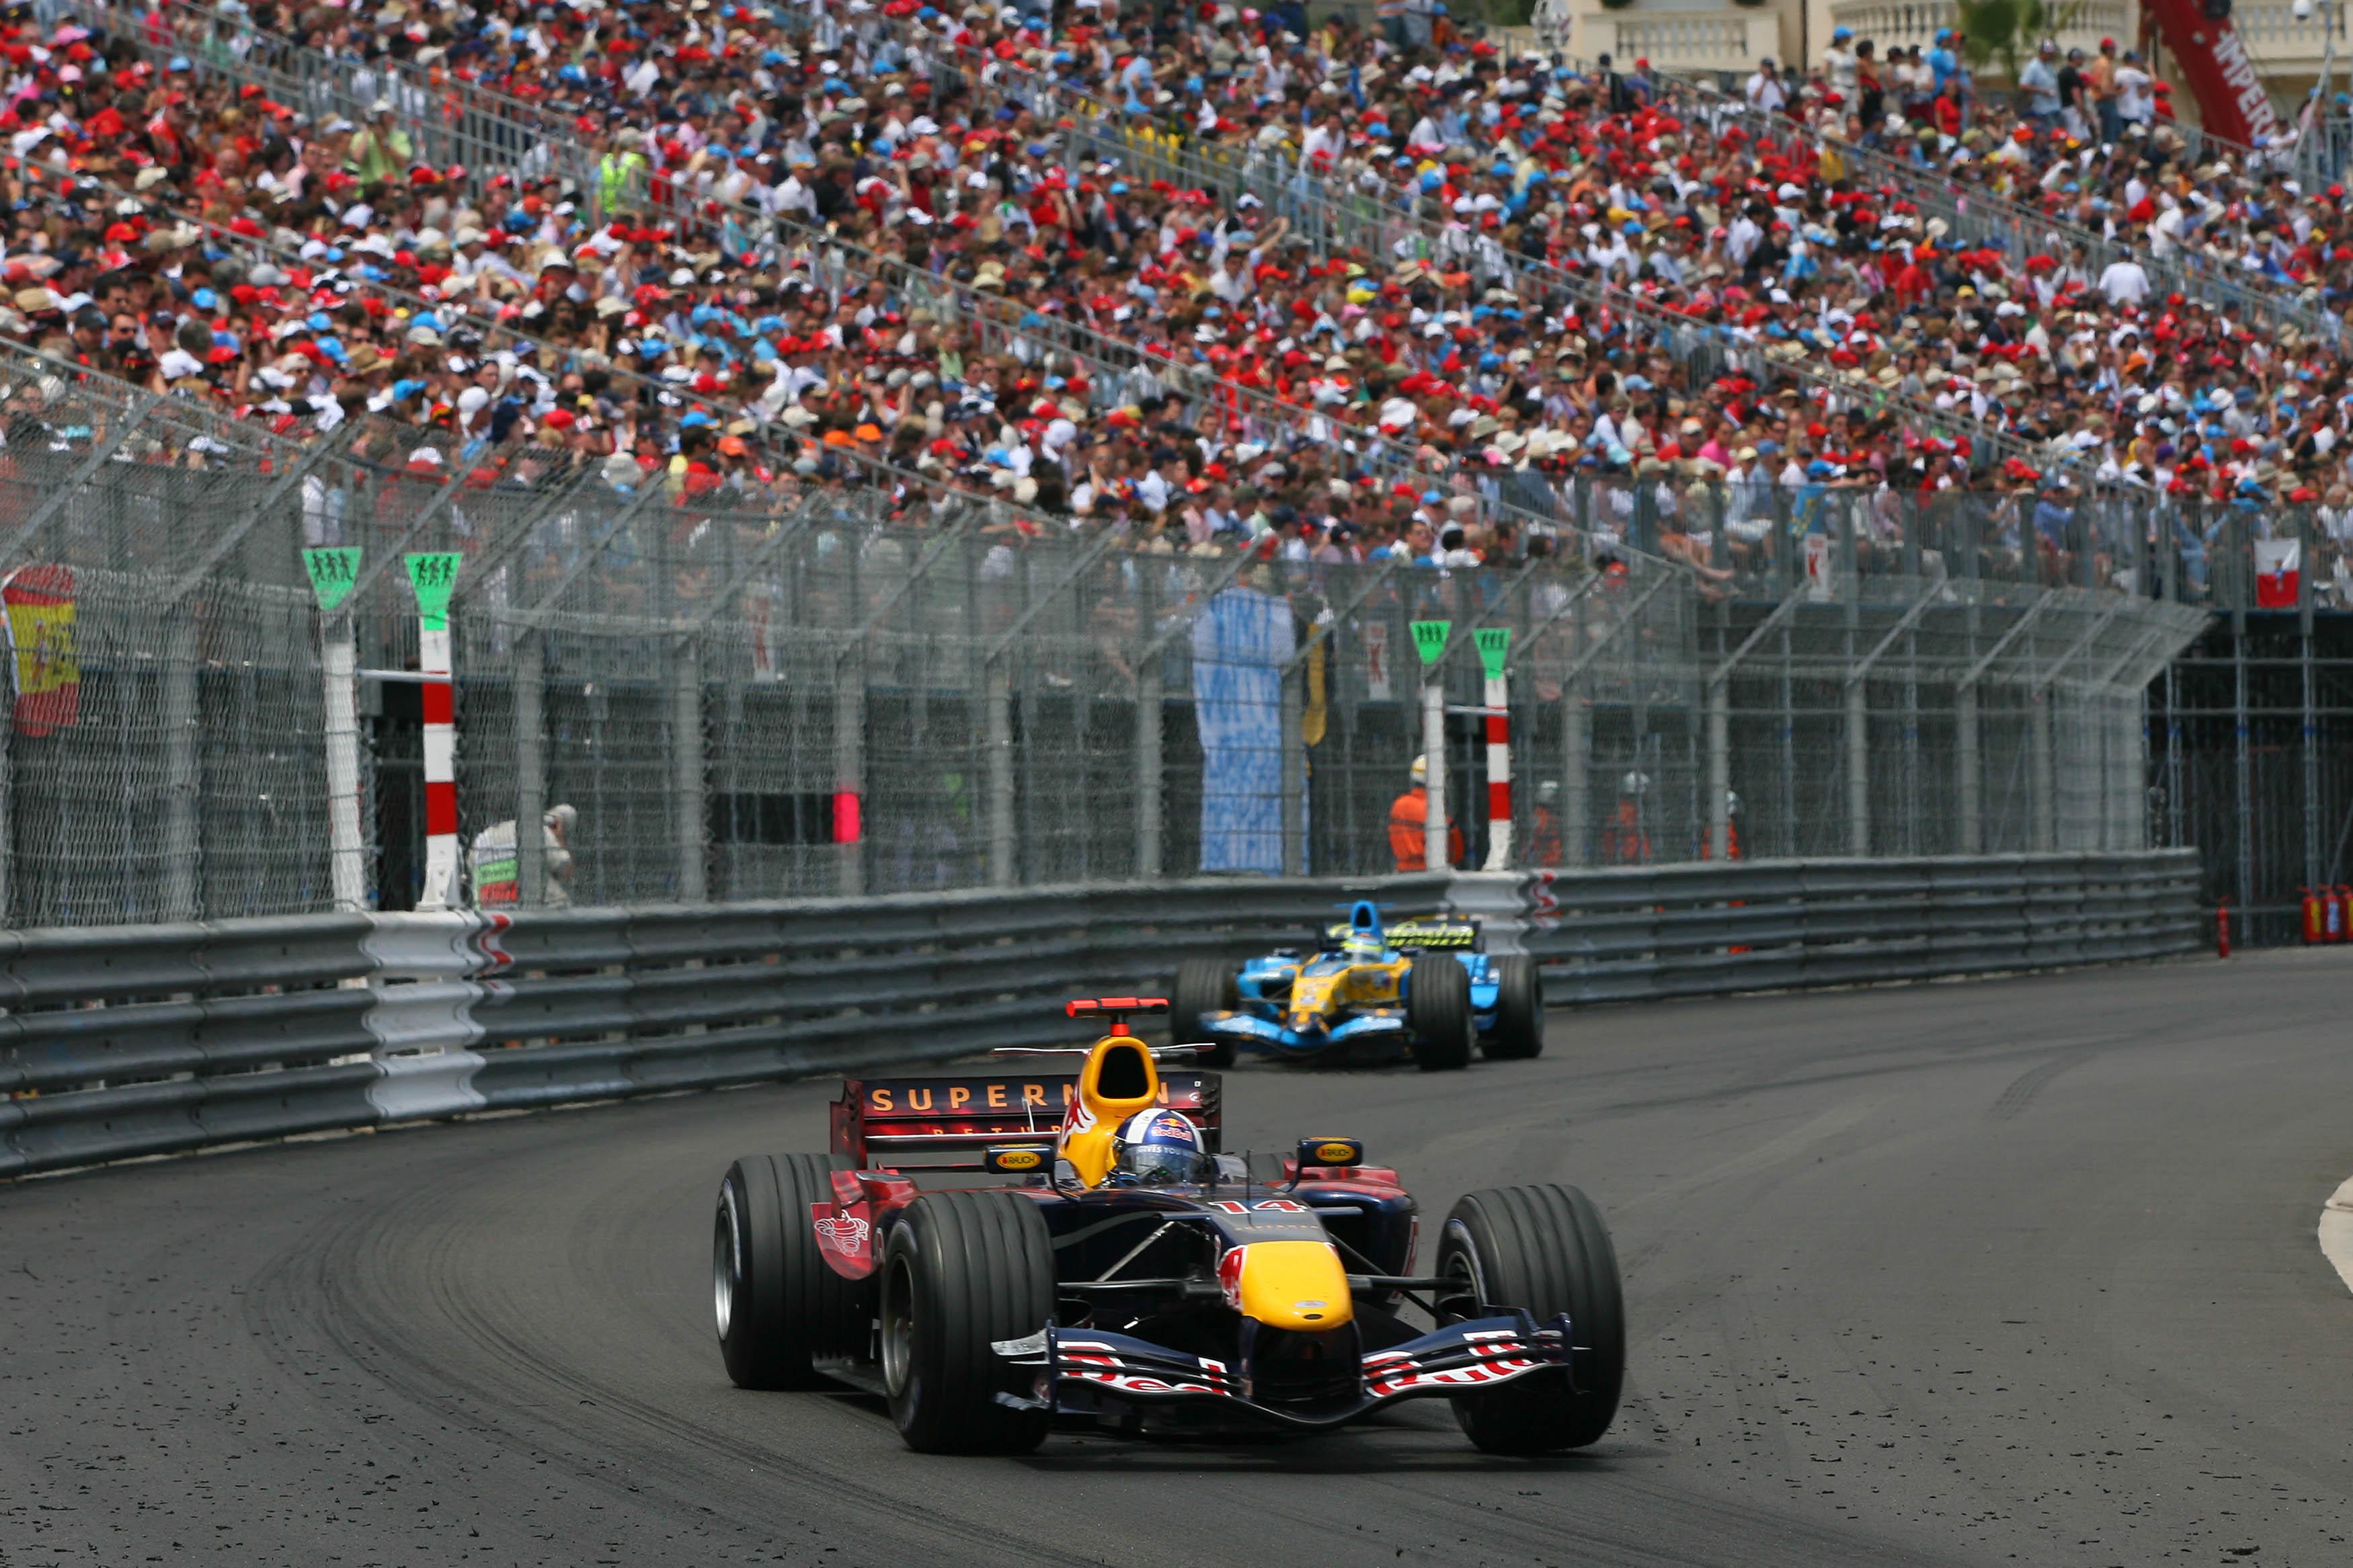 Formula 1 Grand Prix, Monaco, Sunday Race